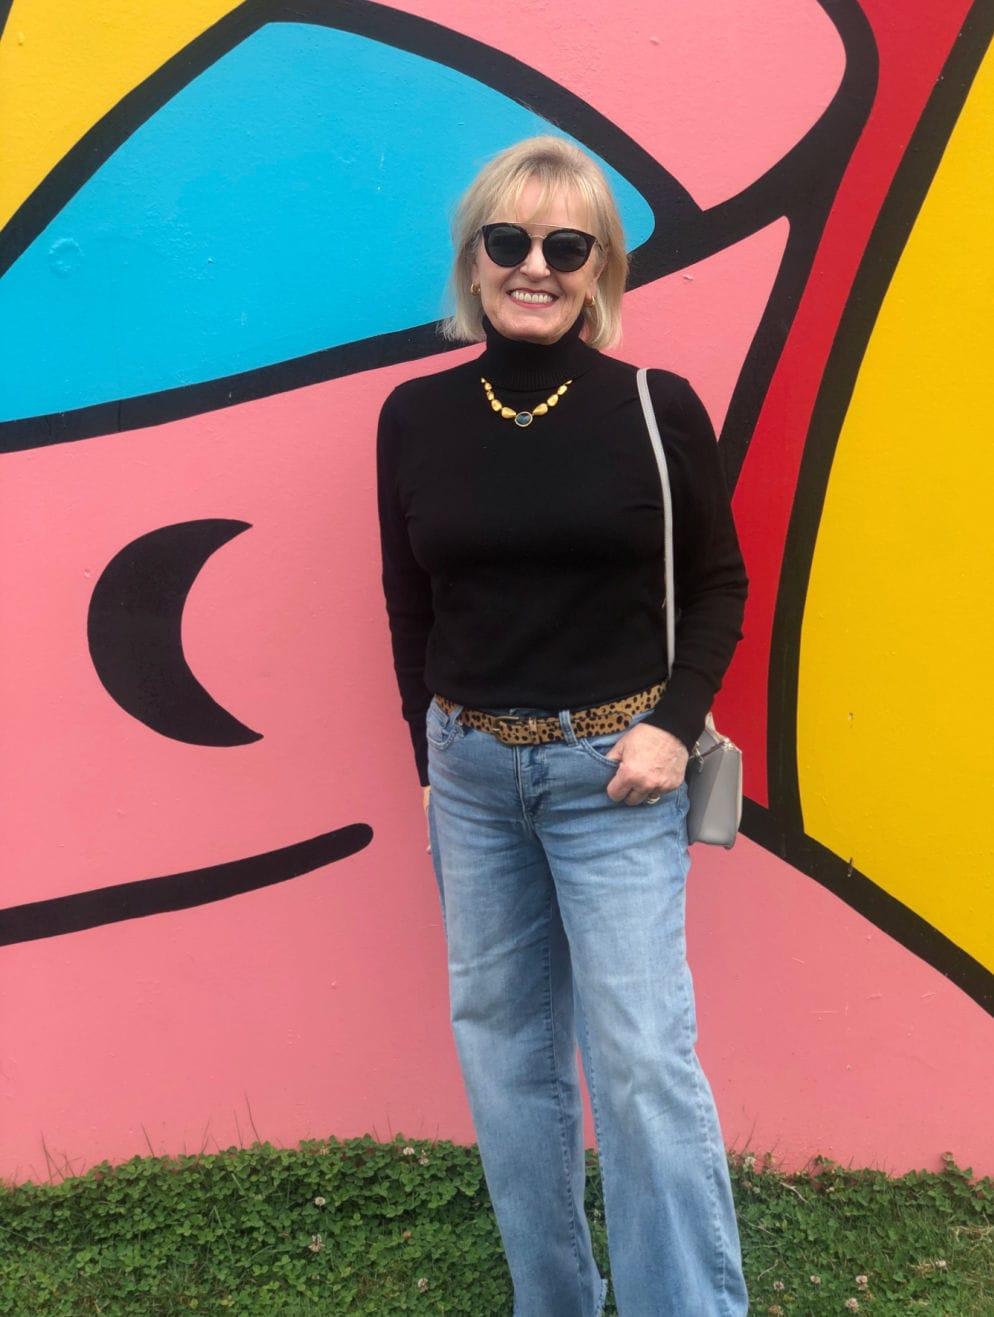 fashion blogger jennifer connolly wearing wide leg jeans